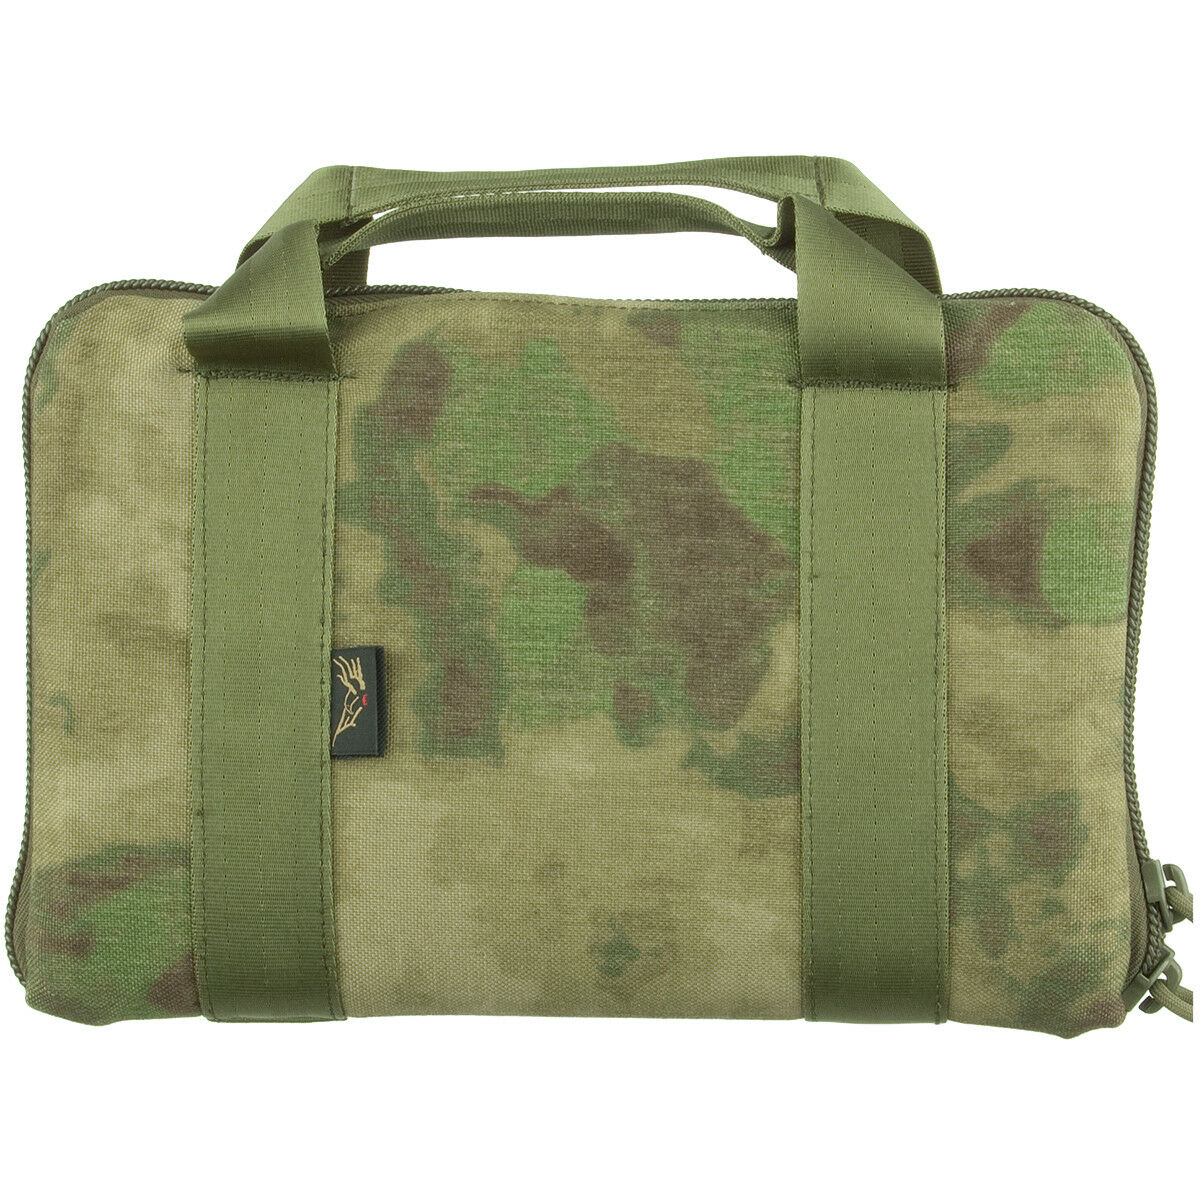 Flyye Pistole Carry Bag Militär Armee Waffe Lagerung Beutel Beutel Beutel A-TACS FG Camouflage fce000